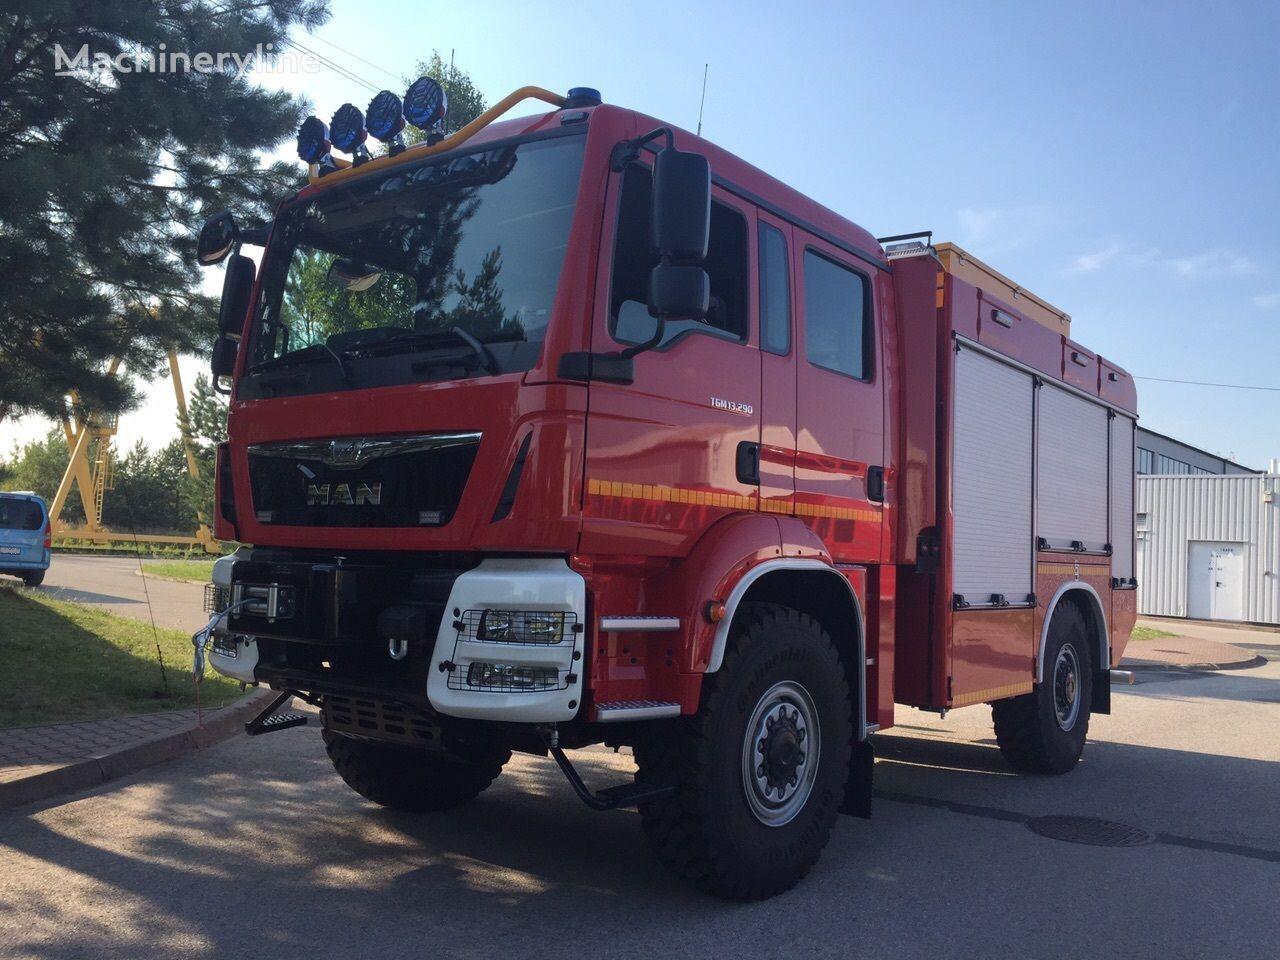 Vente des camion de pompier man tgm 13 290 for Vente de neuf